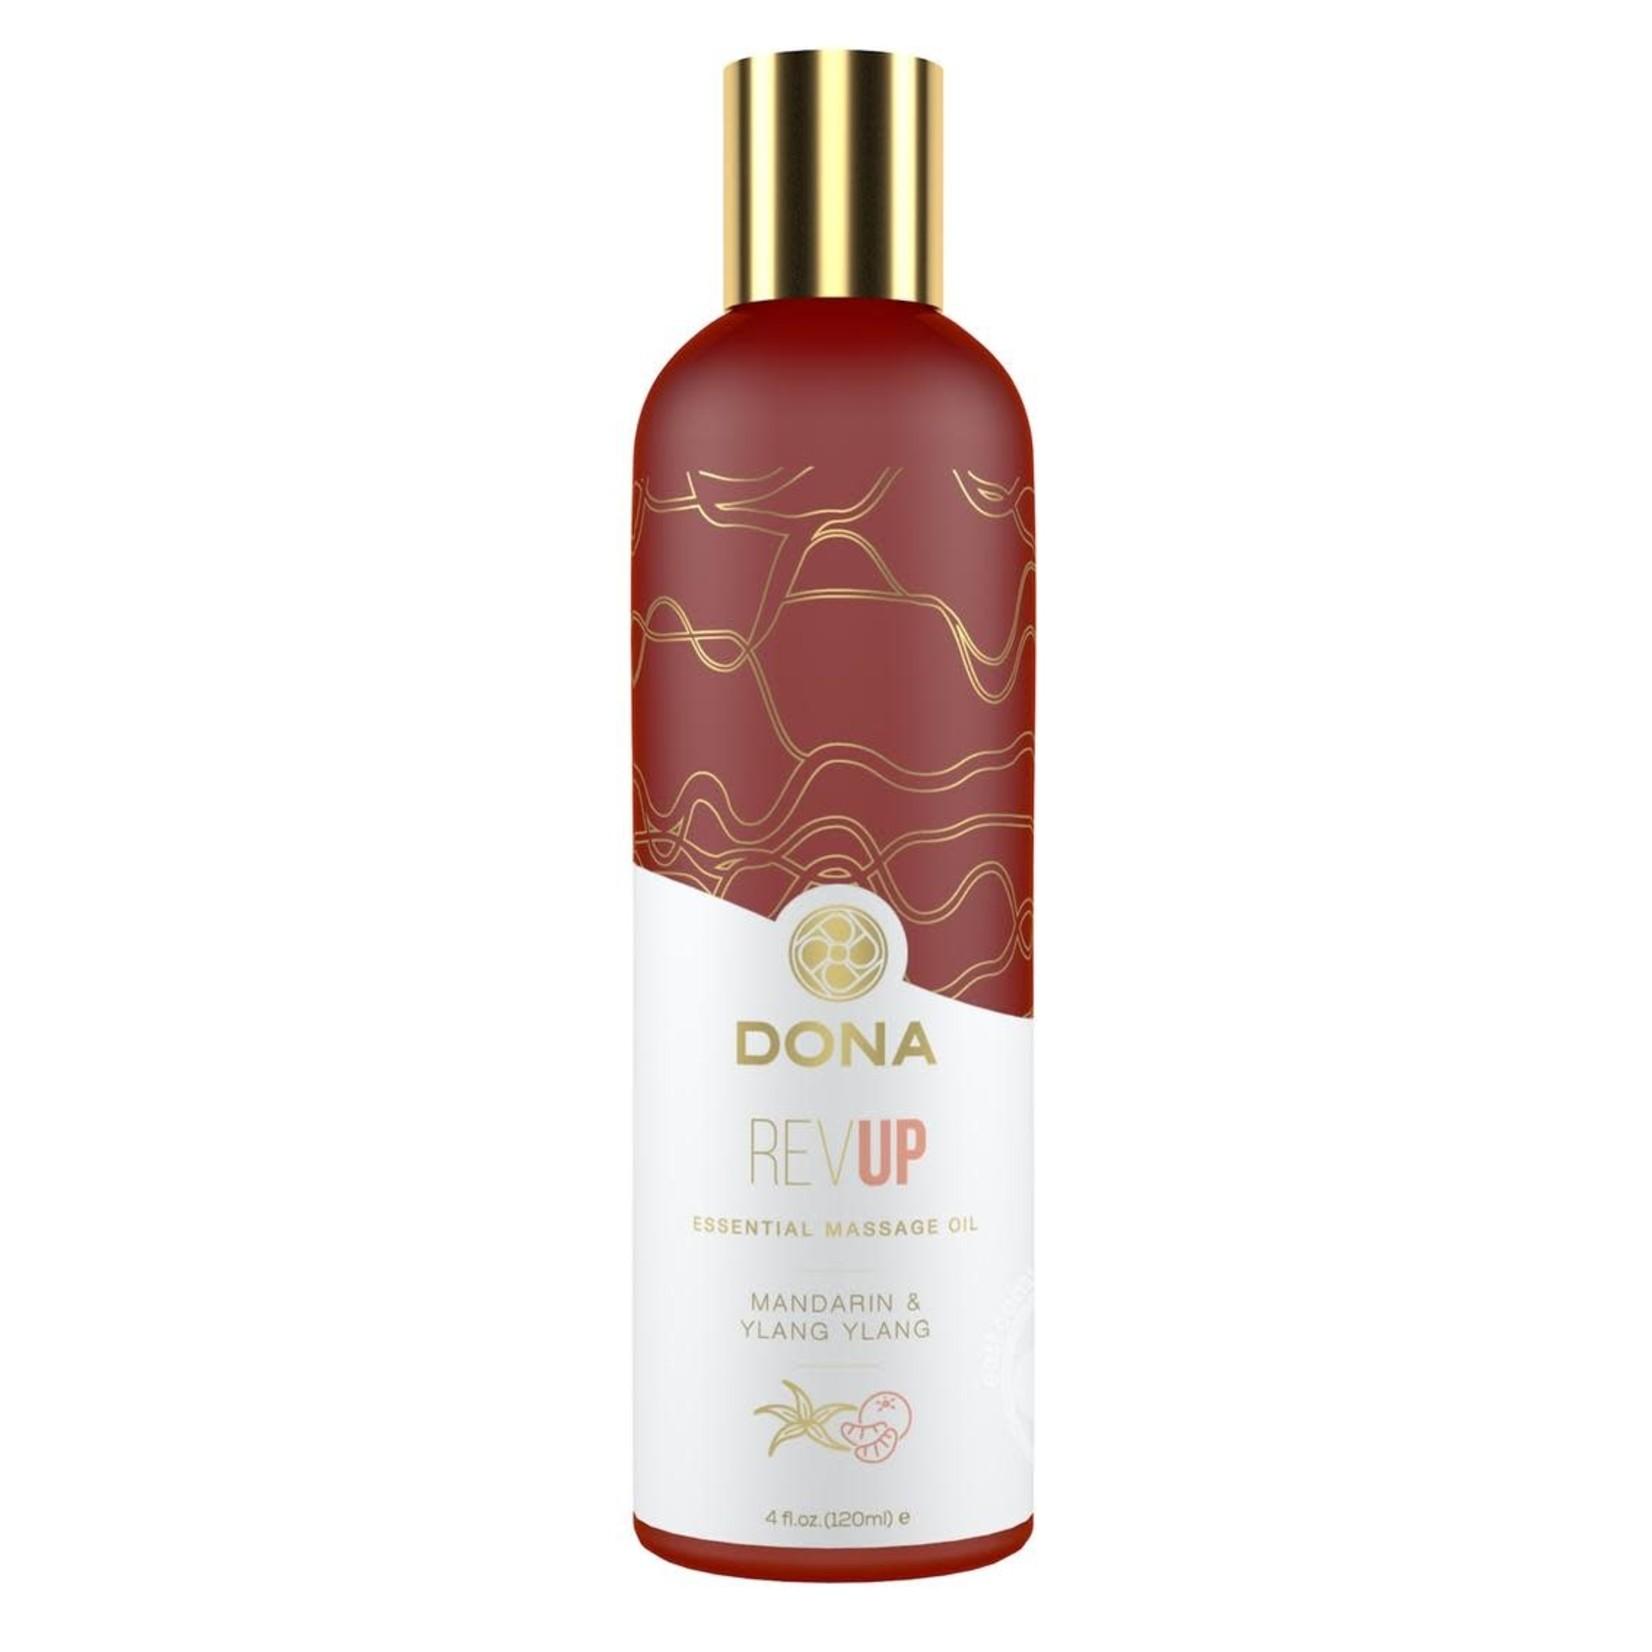 Dona Revup Vegan Massage Oil Revup Mandarin & Ylang Ylang 4oz